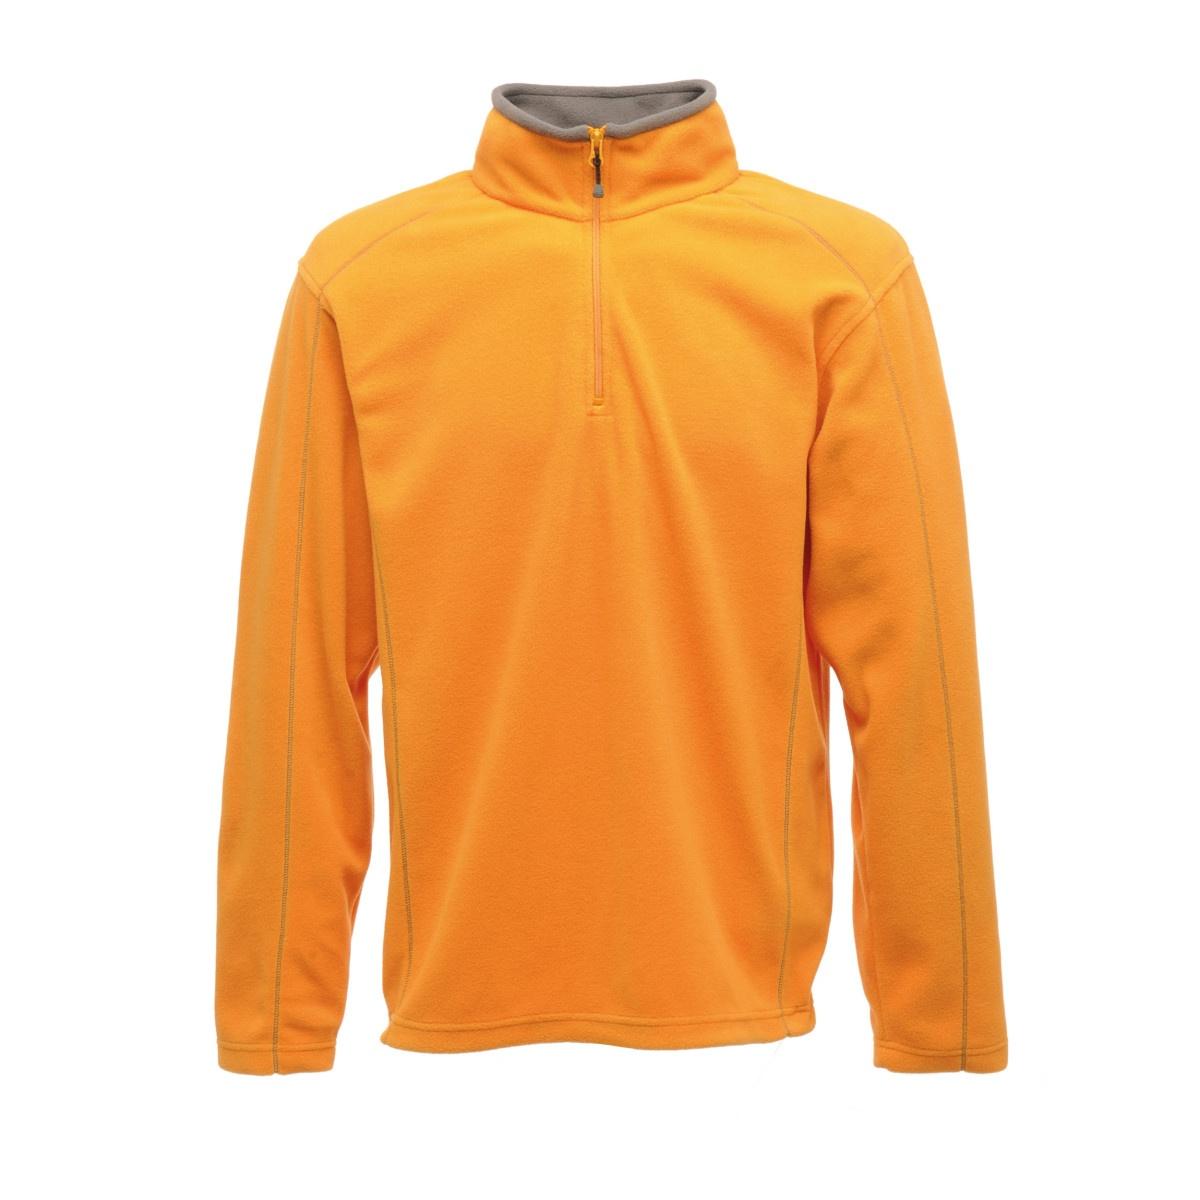 Regatta Mens Standout Ashville Half Zip Winter Fleece Jacket/Pullover Szs XS-3XL | EBay